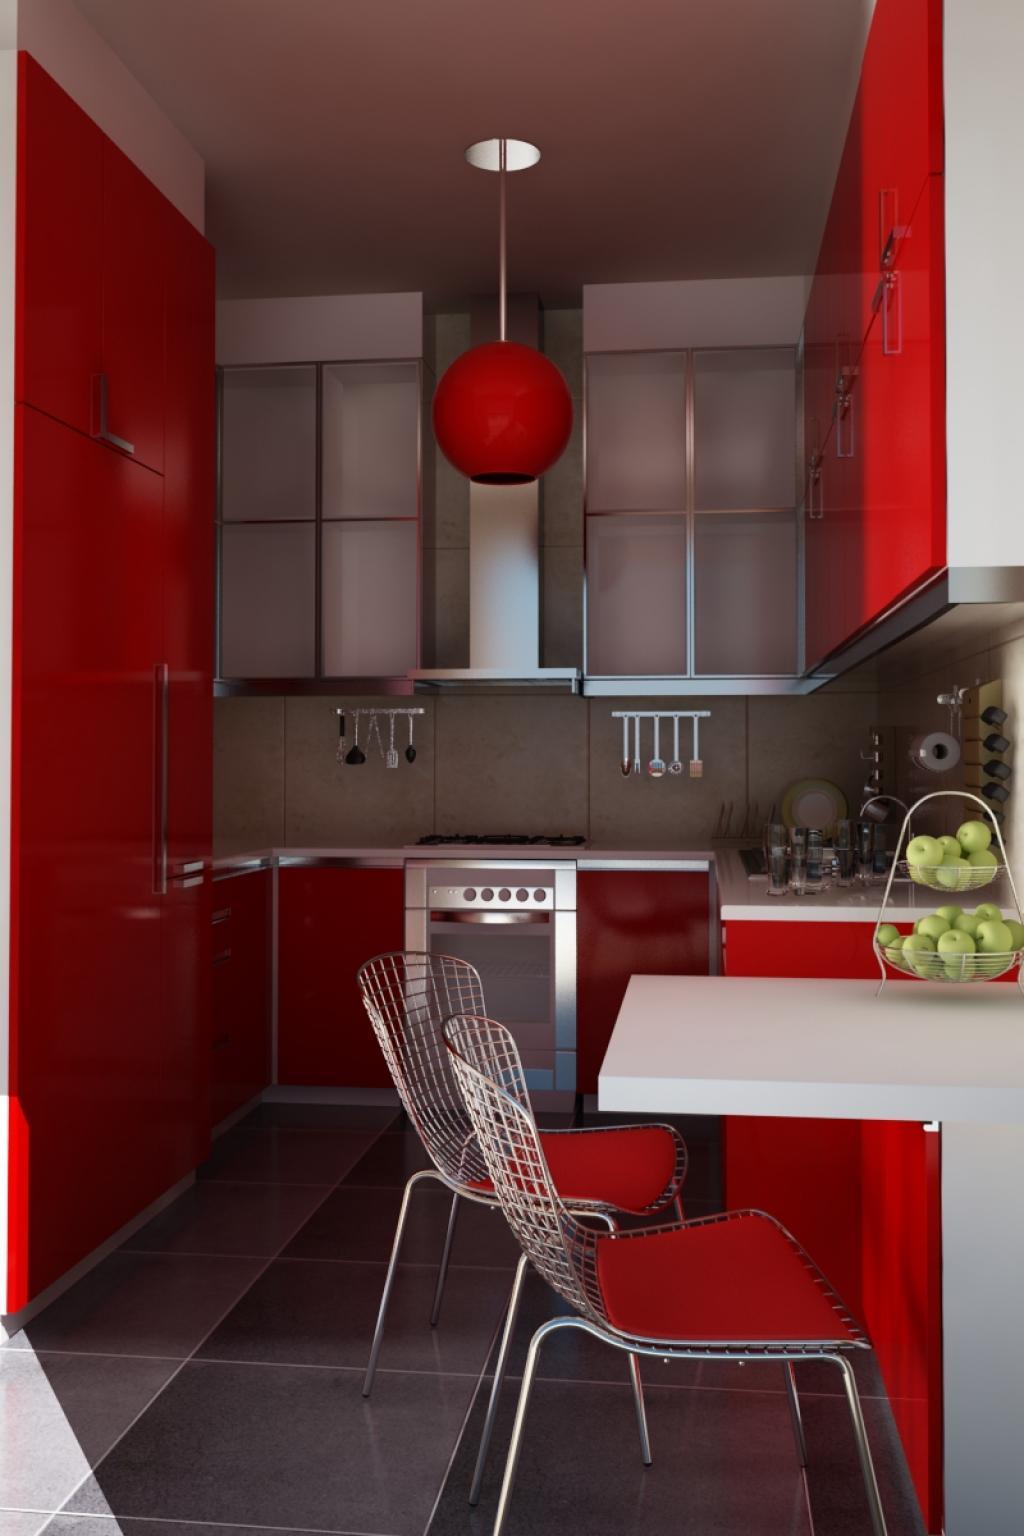 Desain Dapur Merah Hitam Interior Rumah